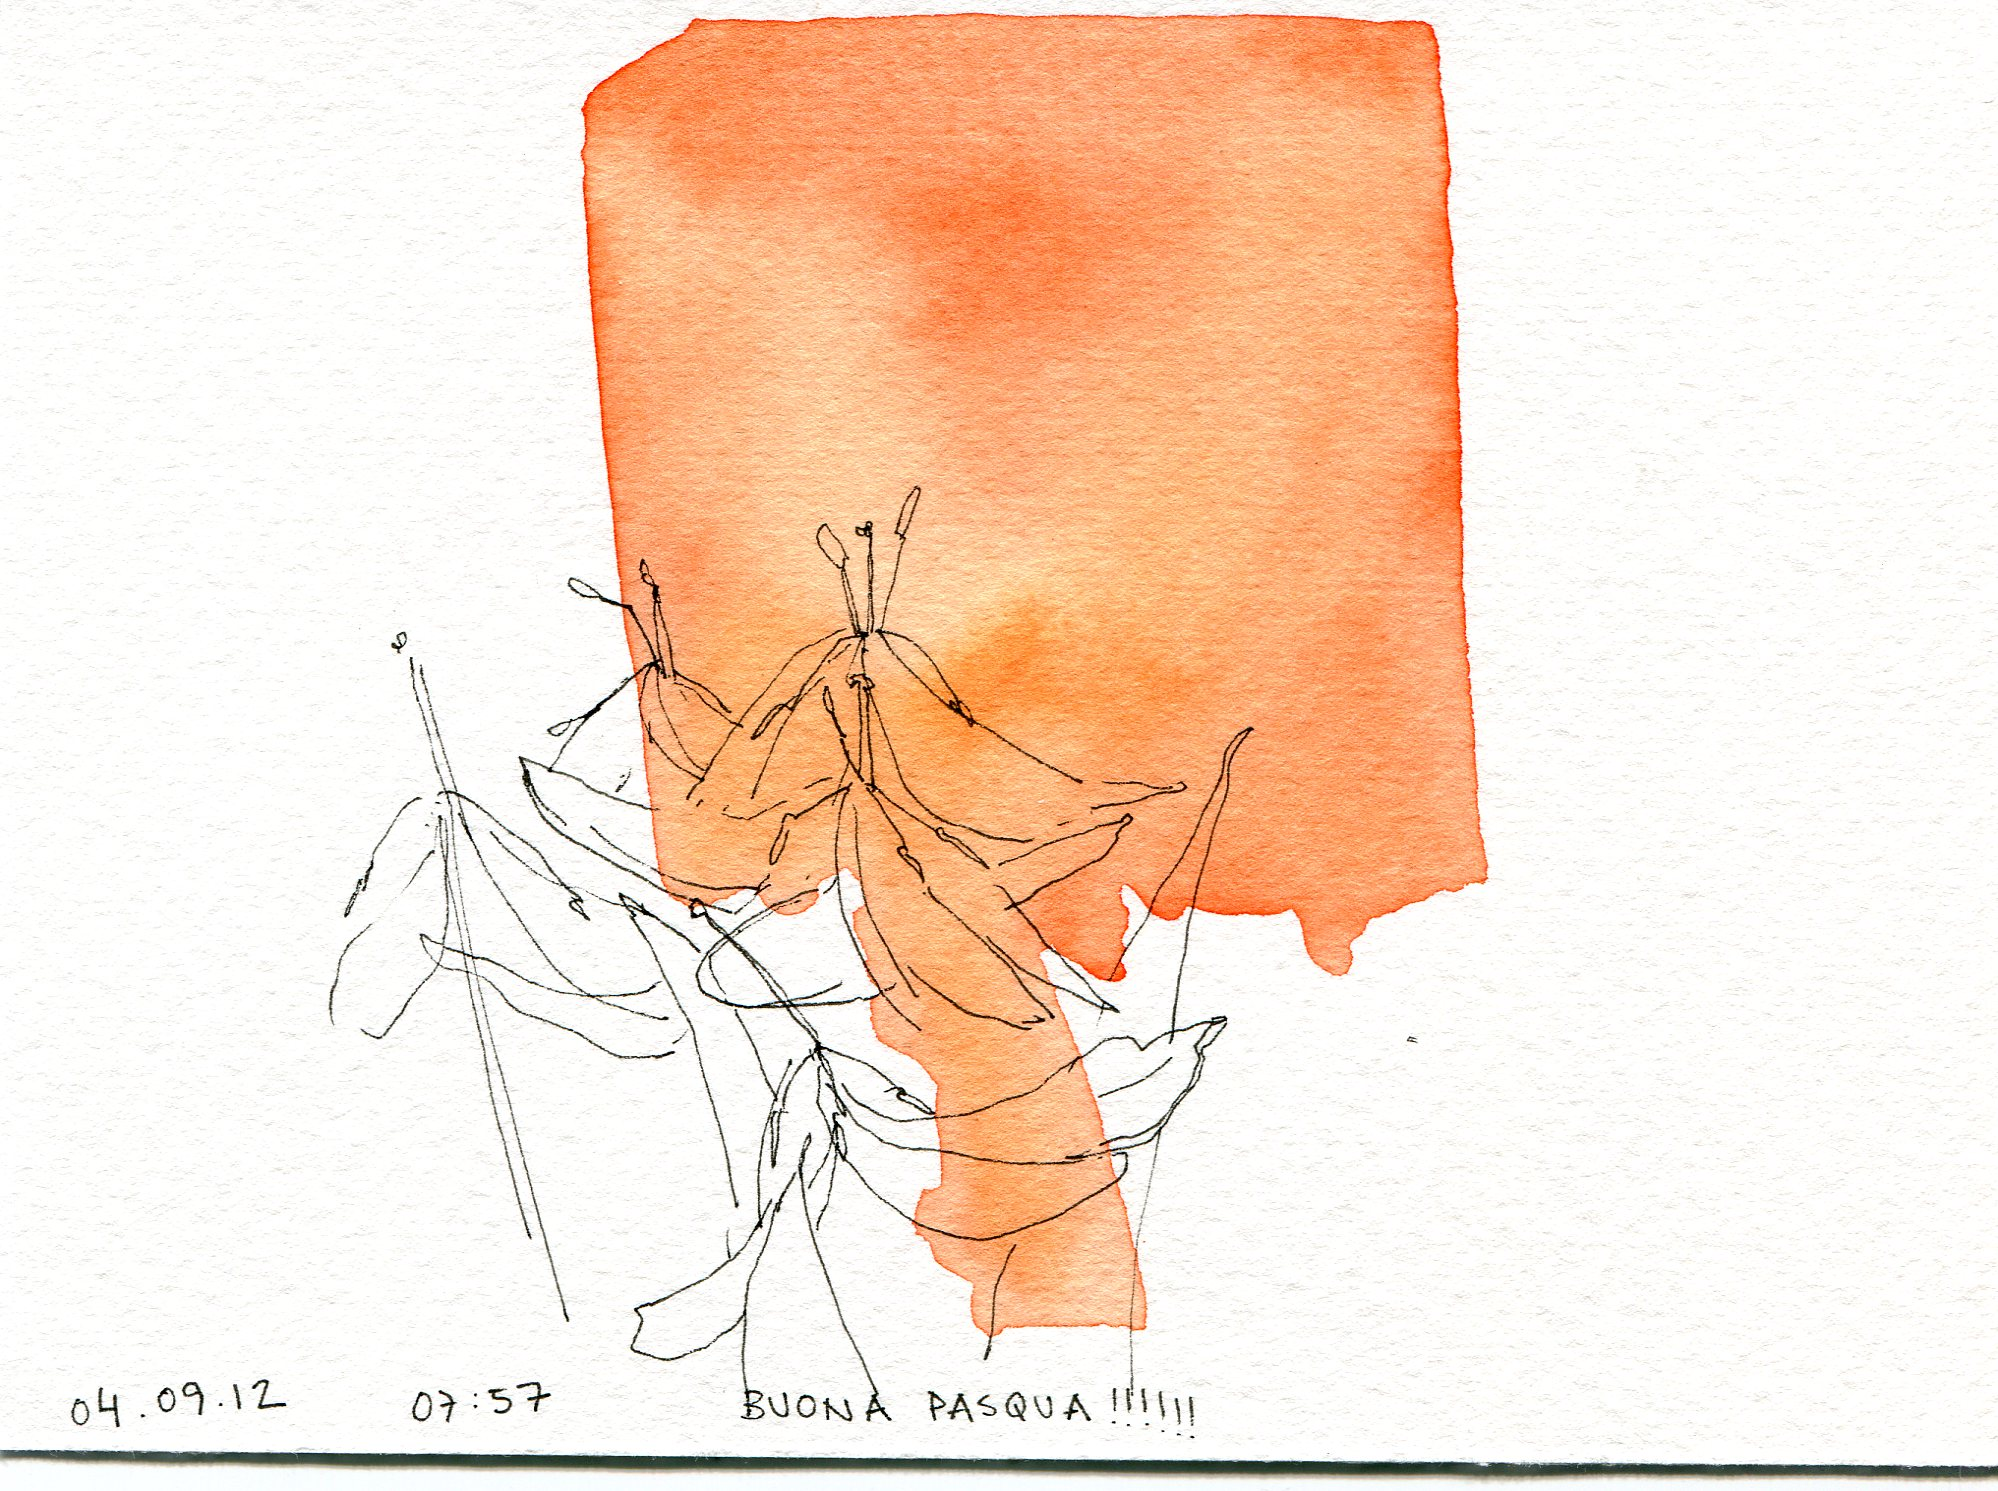 2012-04-14 drawing002.jpg